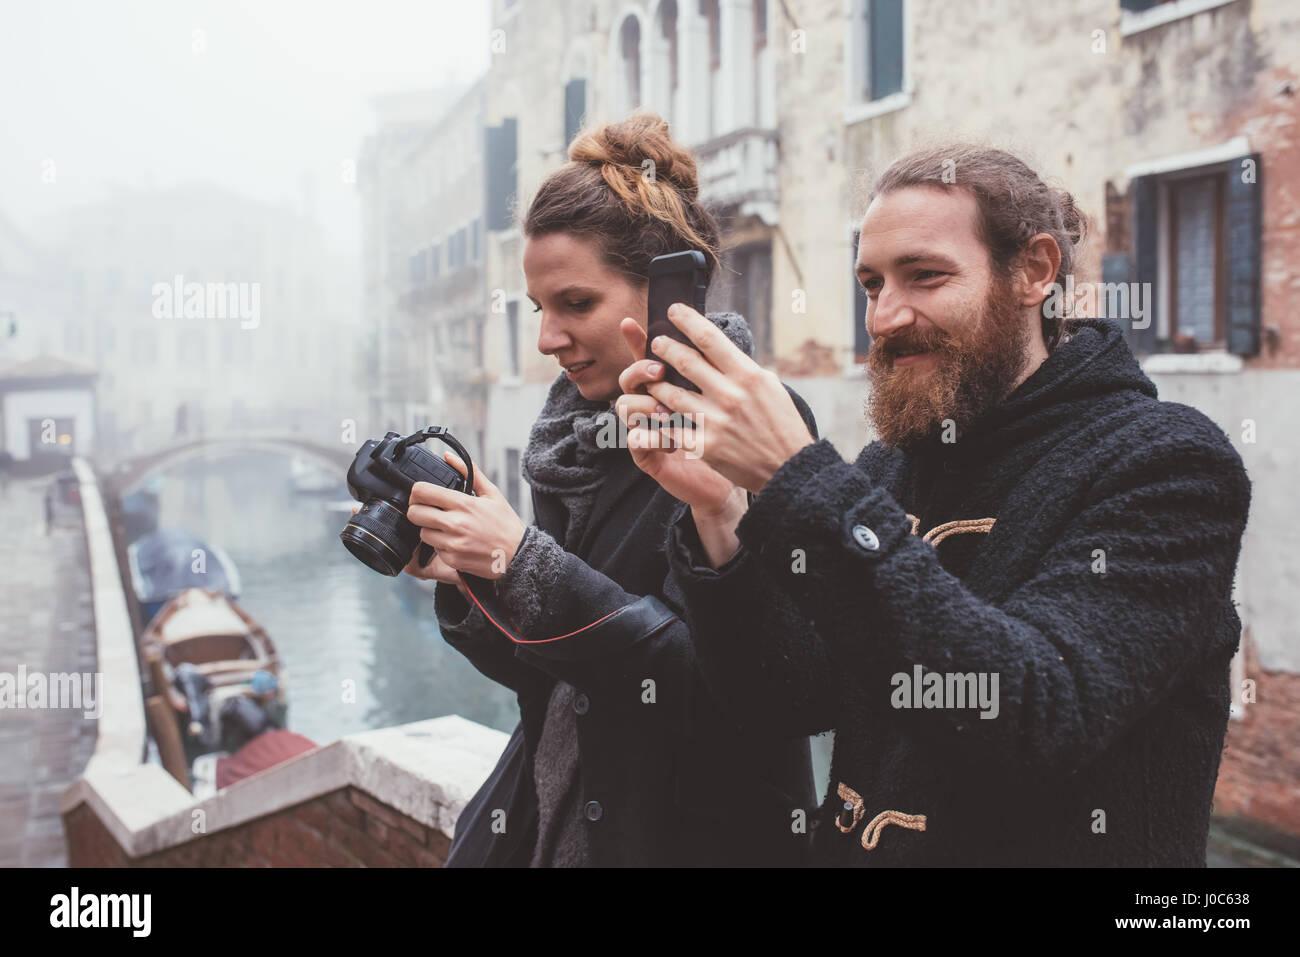 Par fotografiar sobre Misty canal Waterfront, Venecia, Italia Imagen De Stock